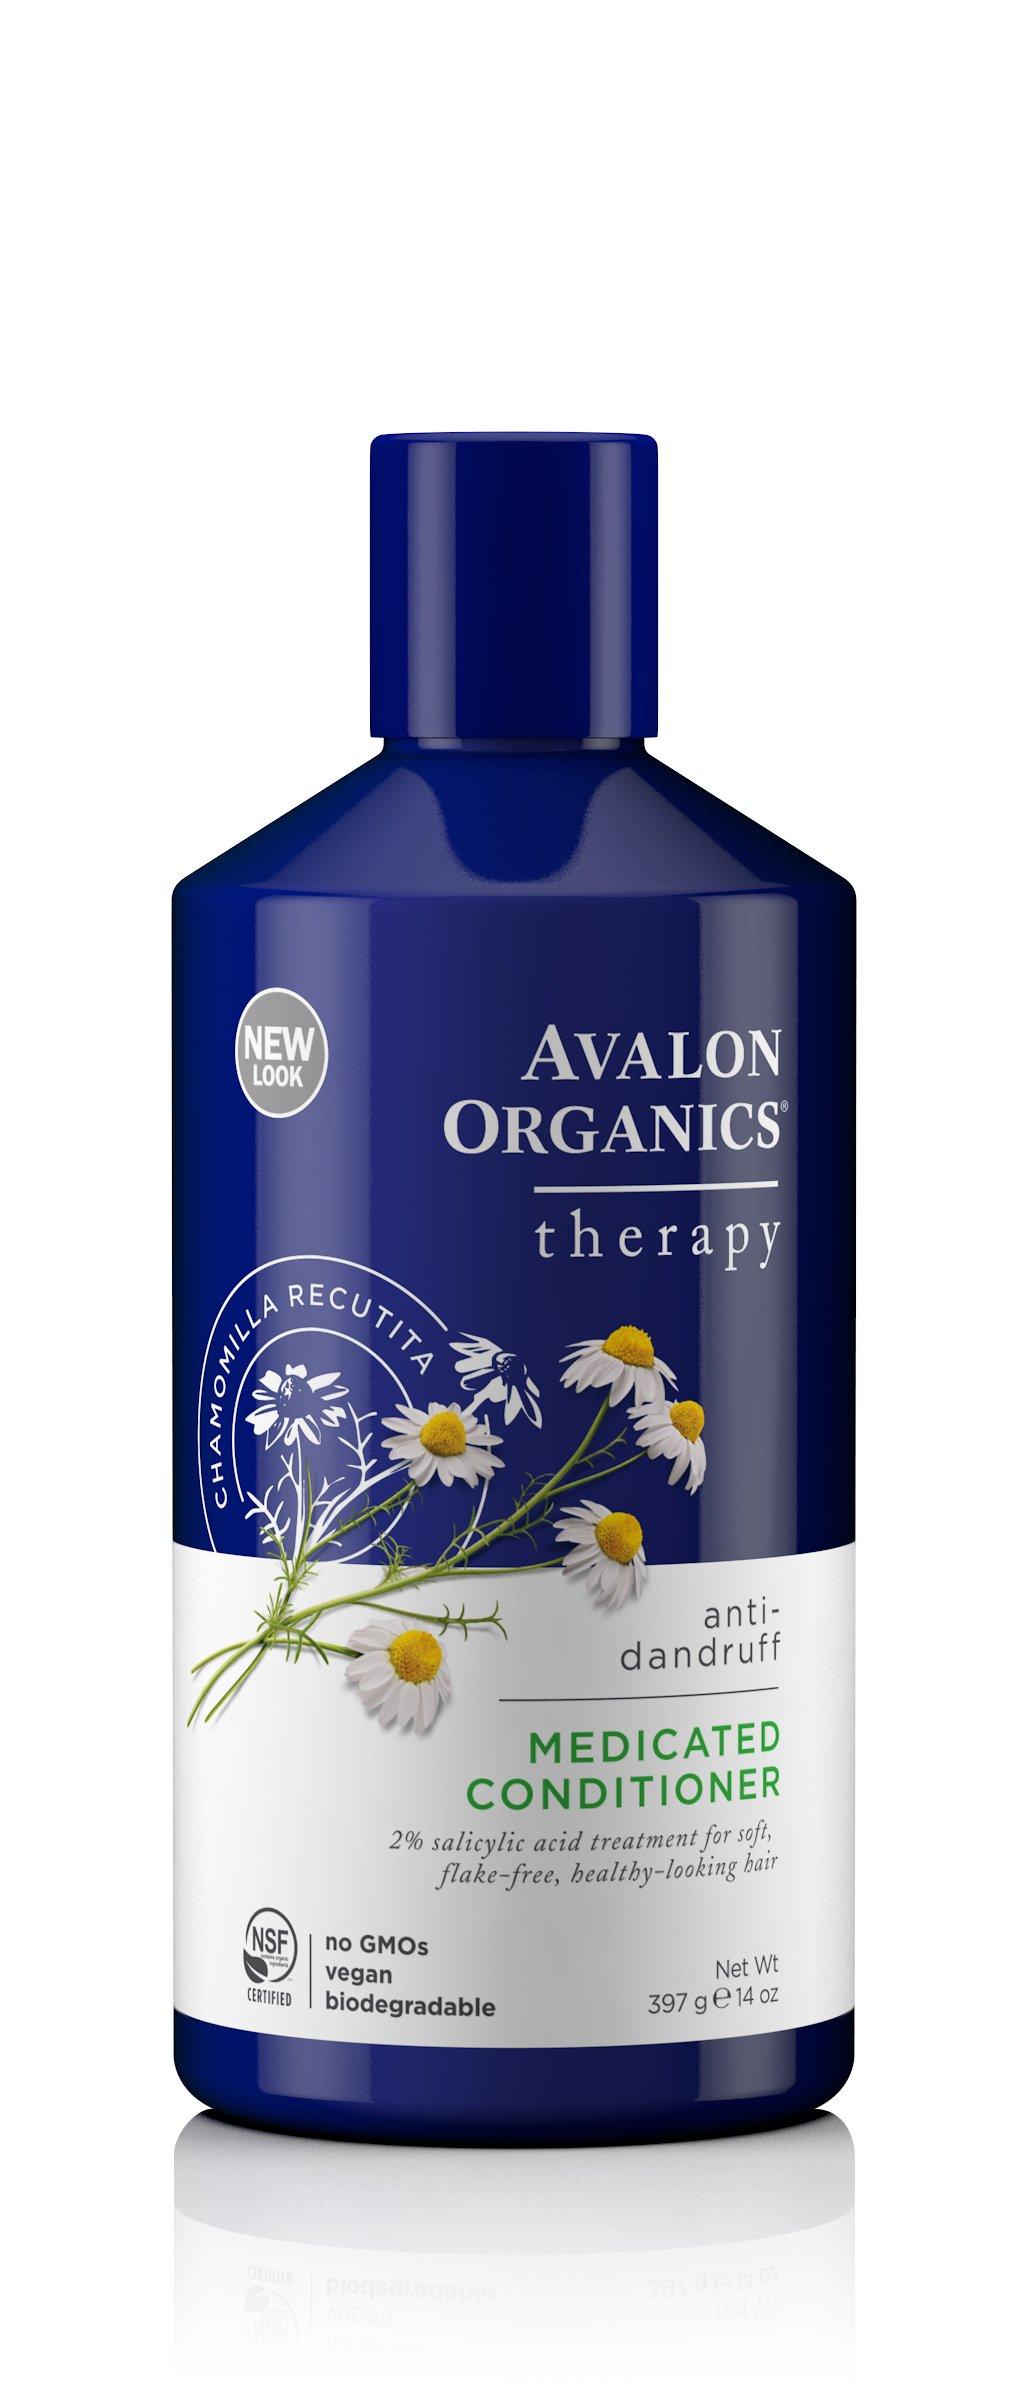 Avalon Organics Anti-Dandruff Itch & Flake Conditioner, 14 Ounce